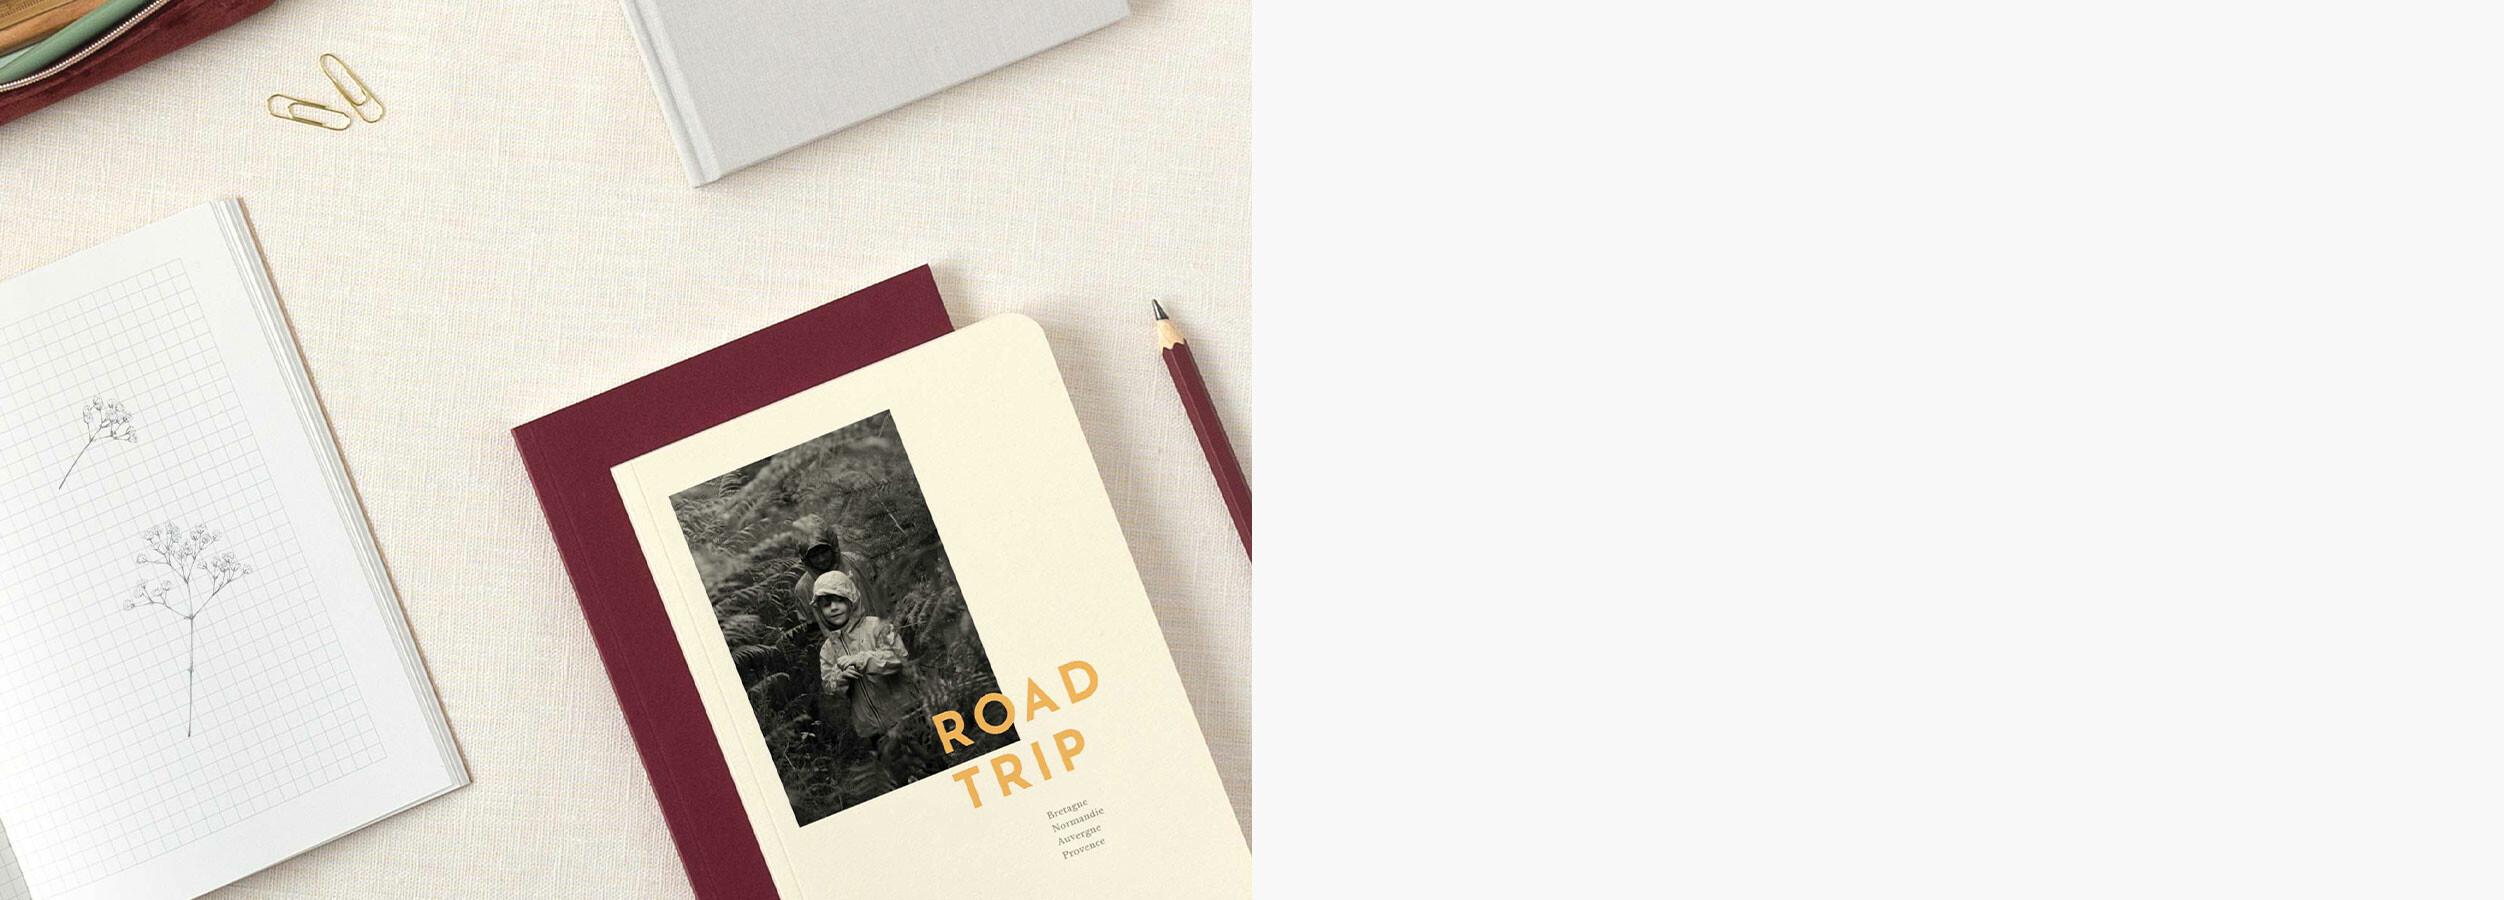 Notizbücher Rosemood